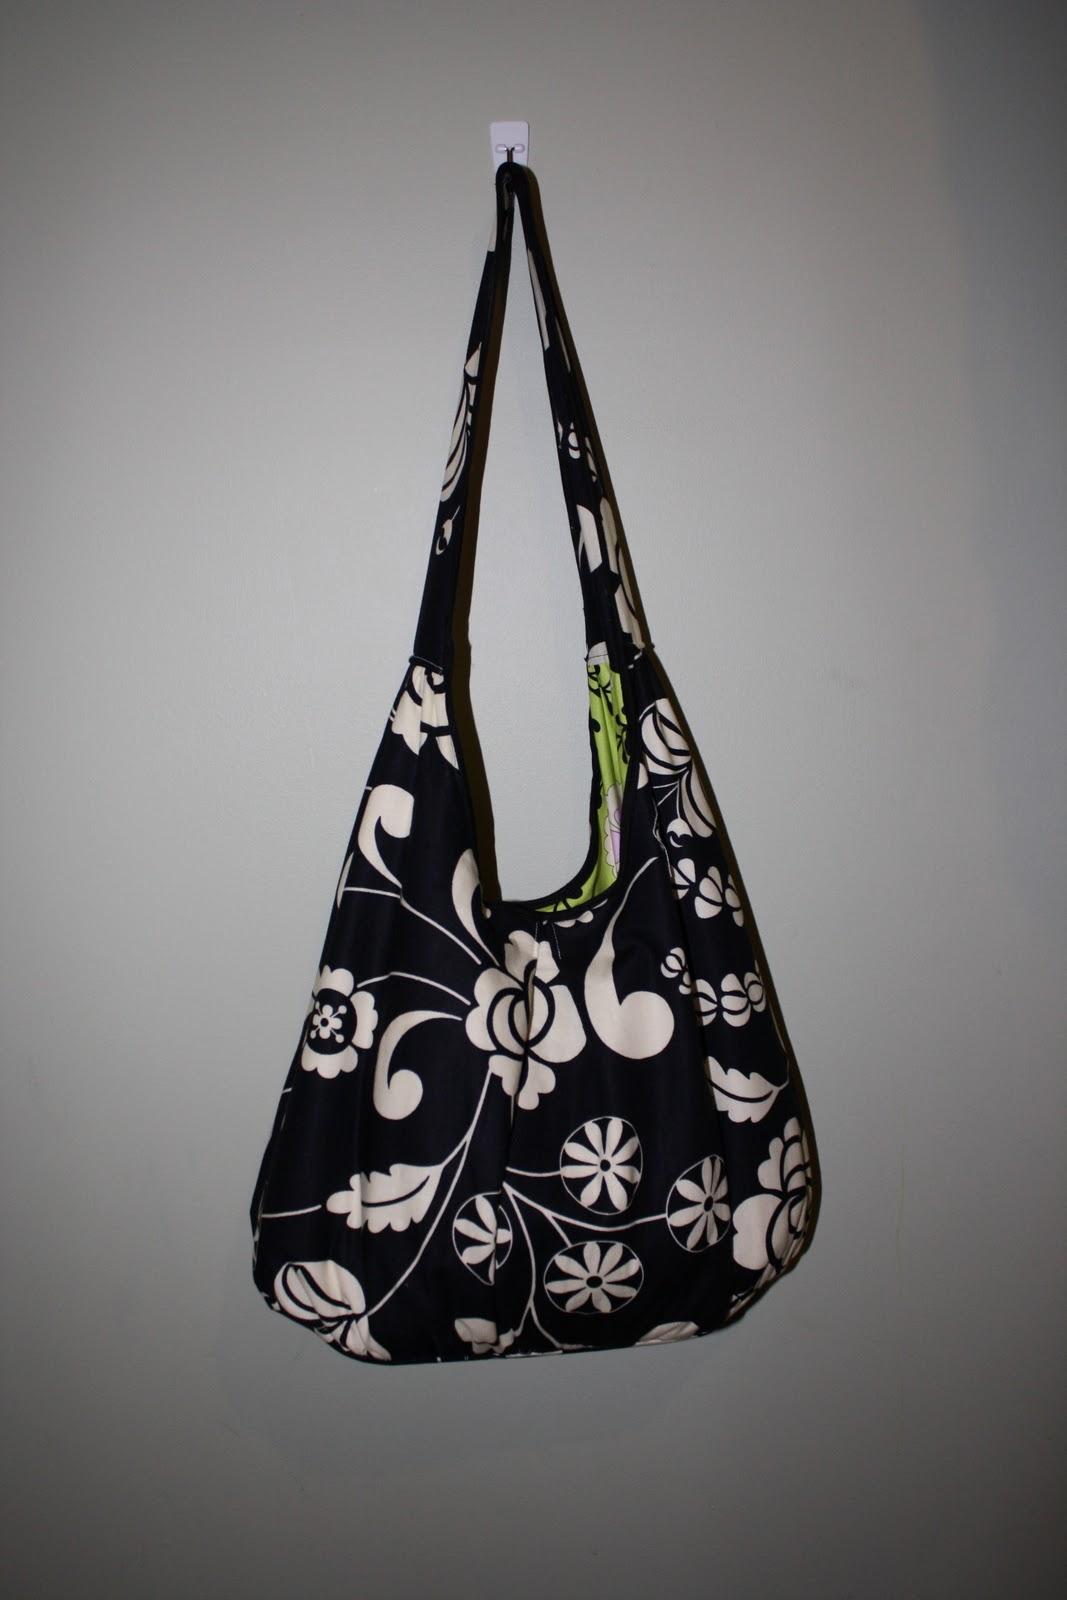 Sling Bag Pattern Free Download : Sling Bag Pattern A new bag pattern.